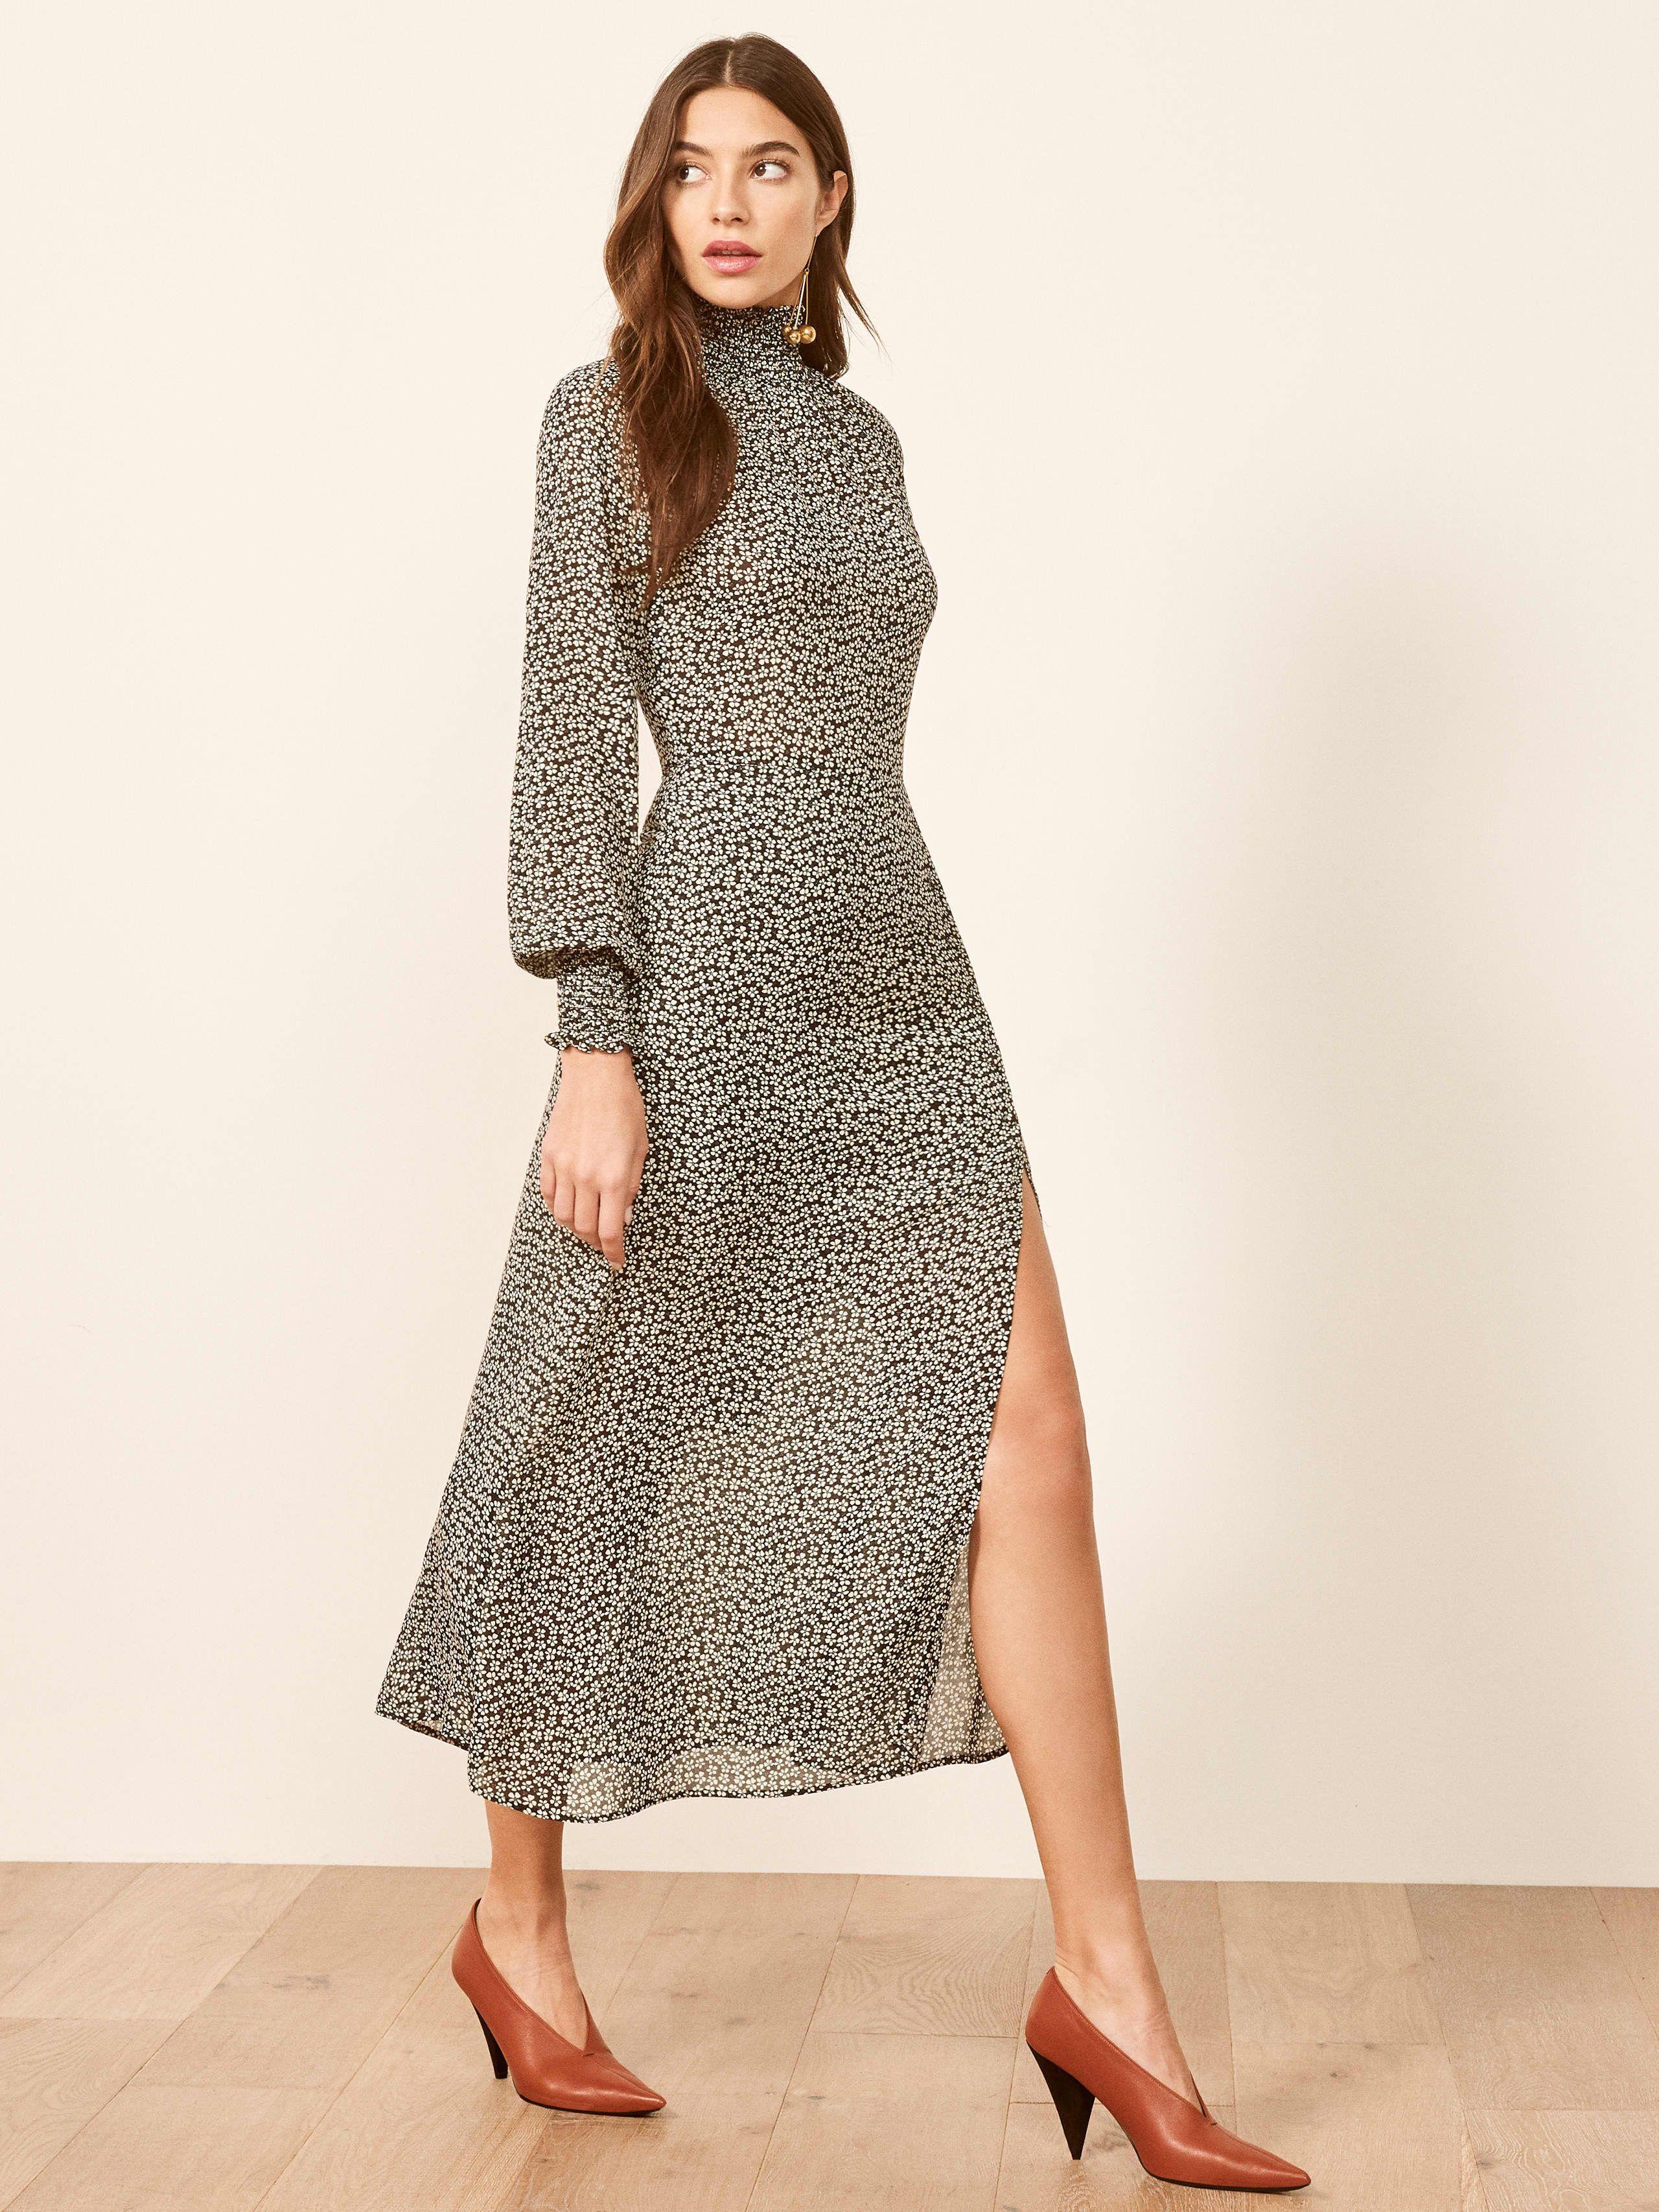 43bd3de616d 17 Long-Sleeve Midi Dresses For Your Winter Wardrobe Consideration   refinery29 https